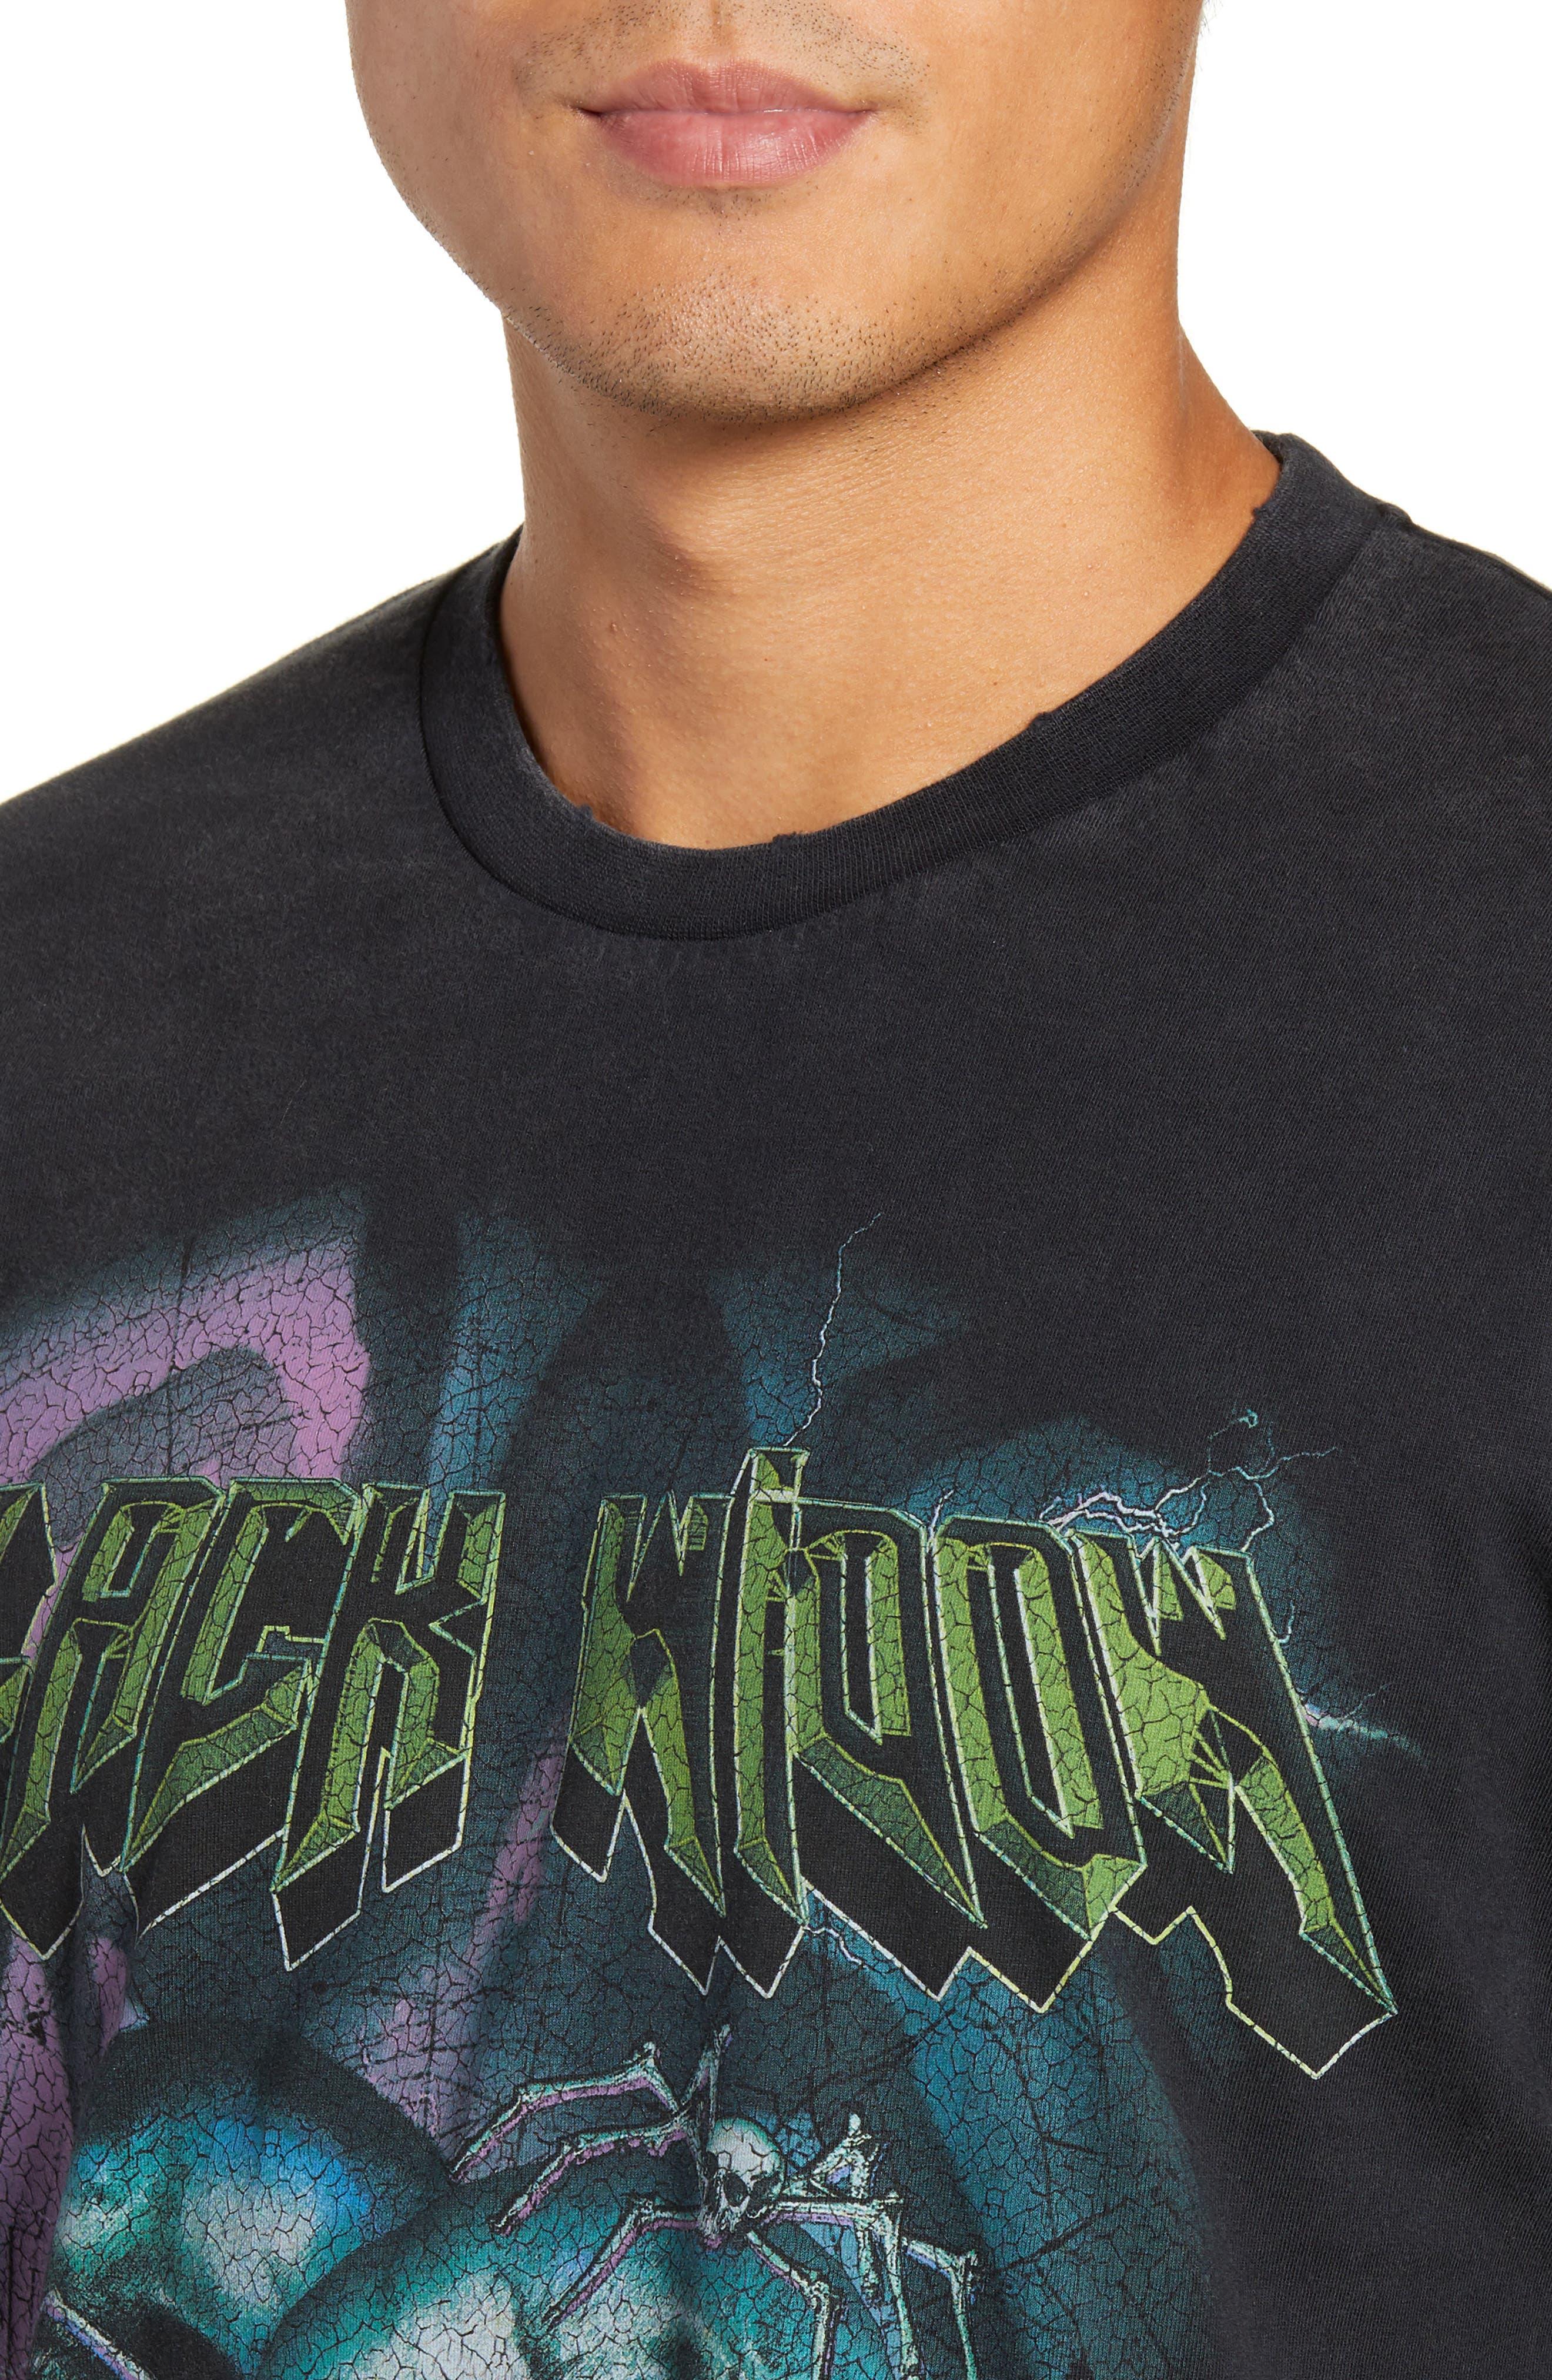 Black Widow Graphic T-Shirt,                             Alternate thumbnail 4, color,                             001